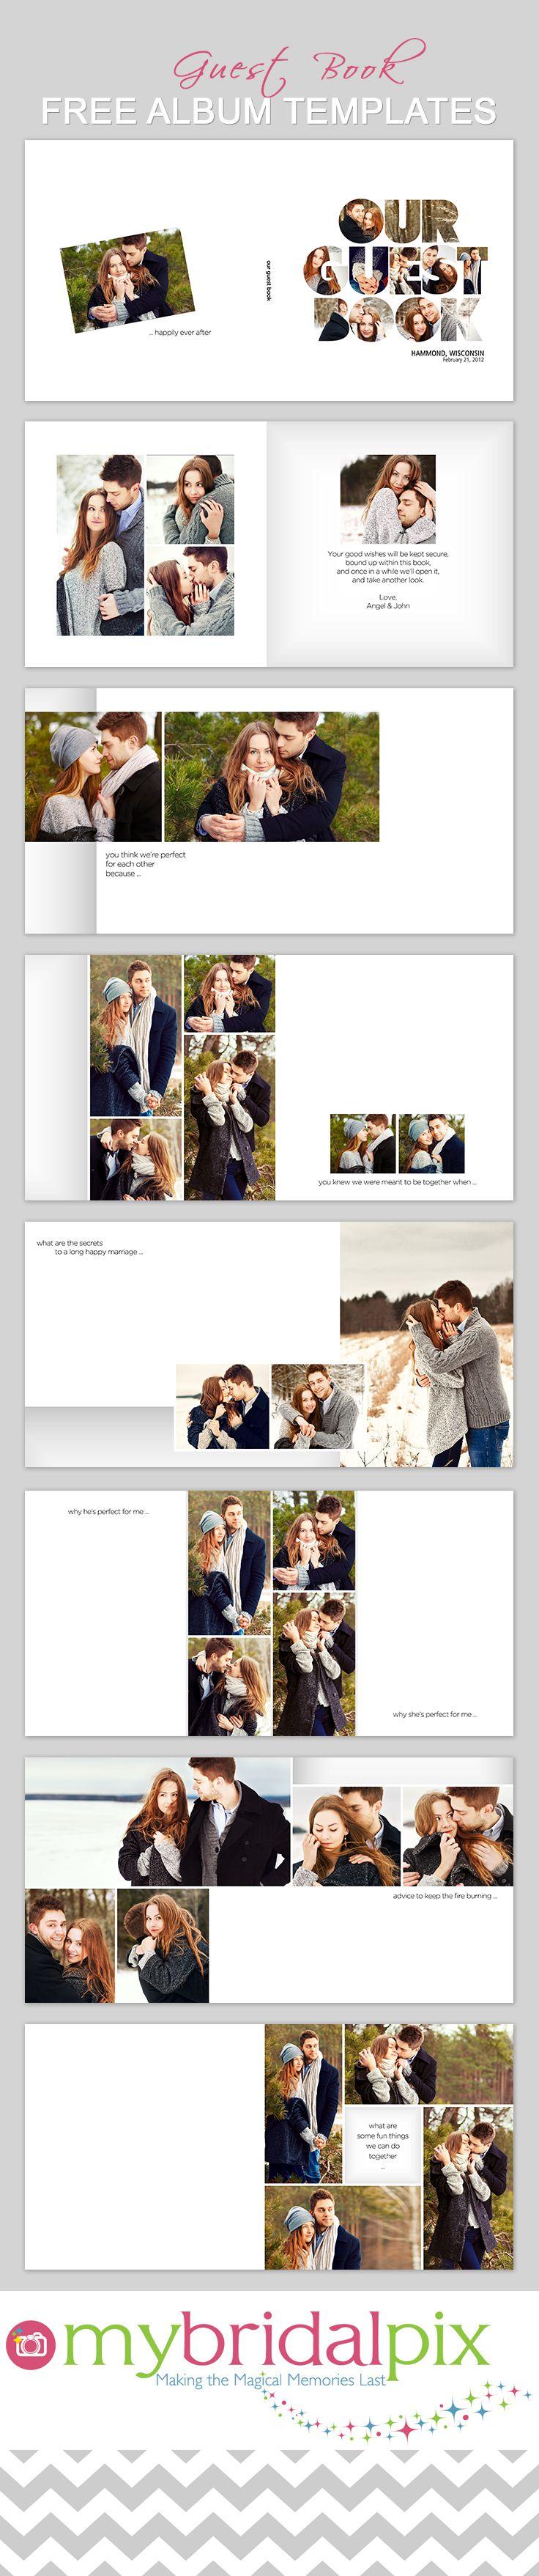 wedding guest book pages printable 281f996396ef katalogi